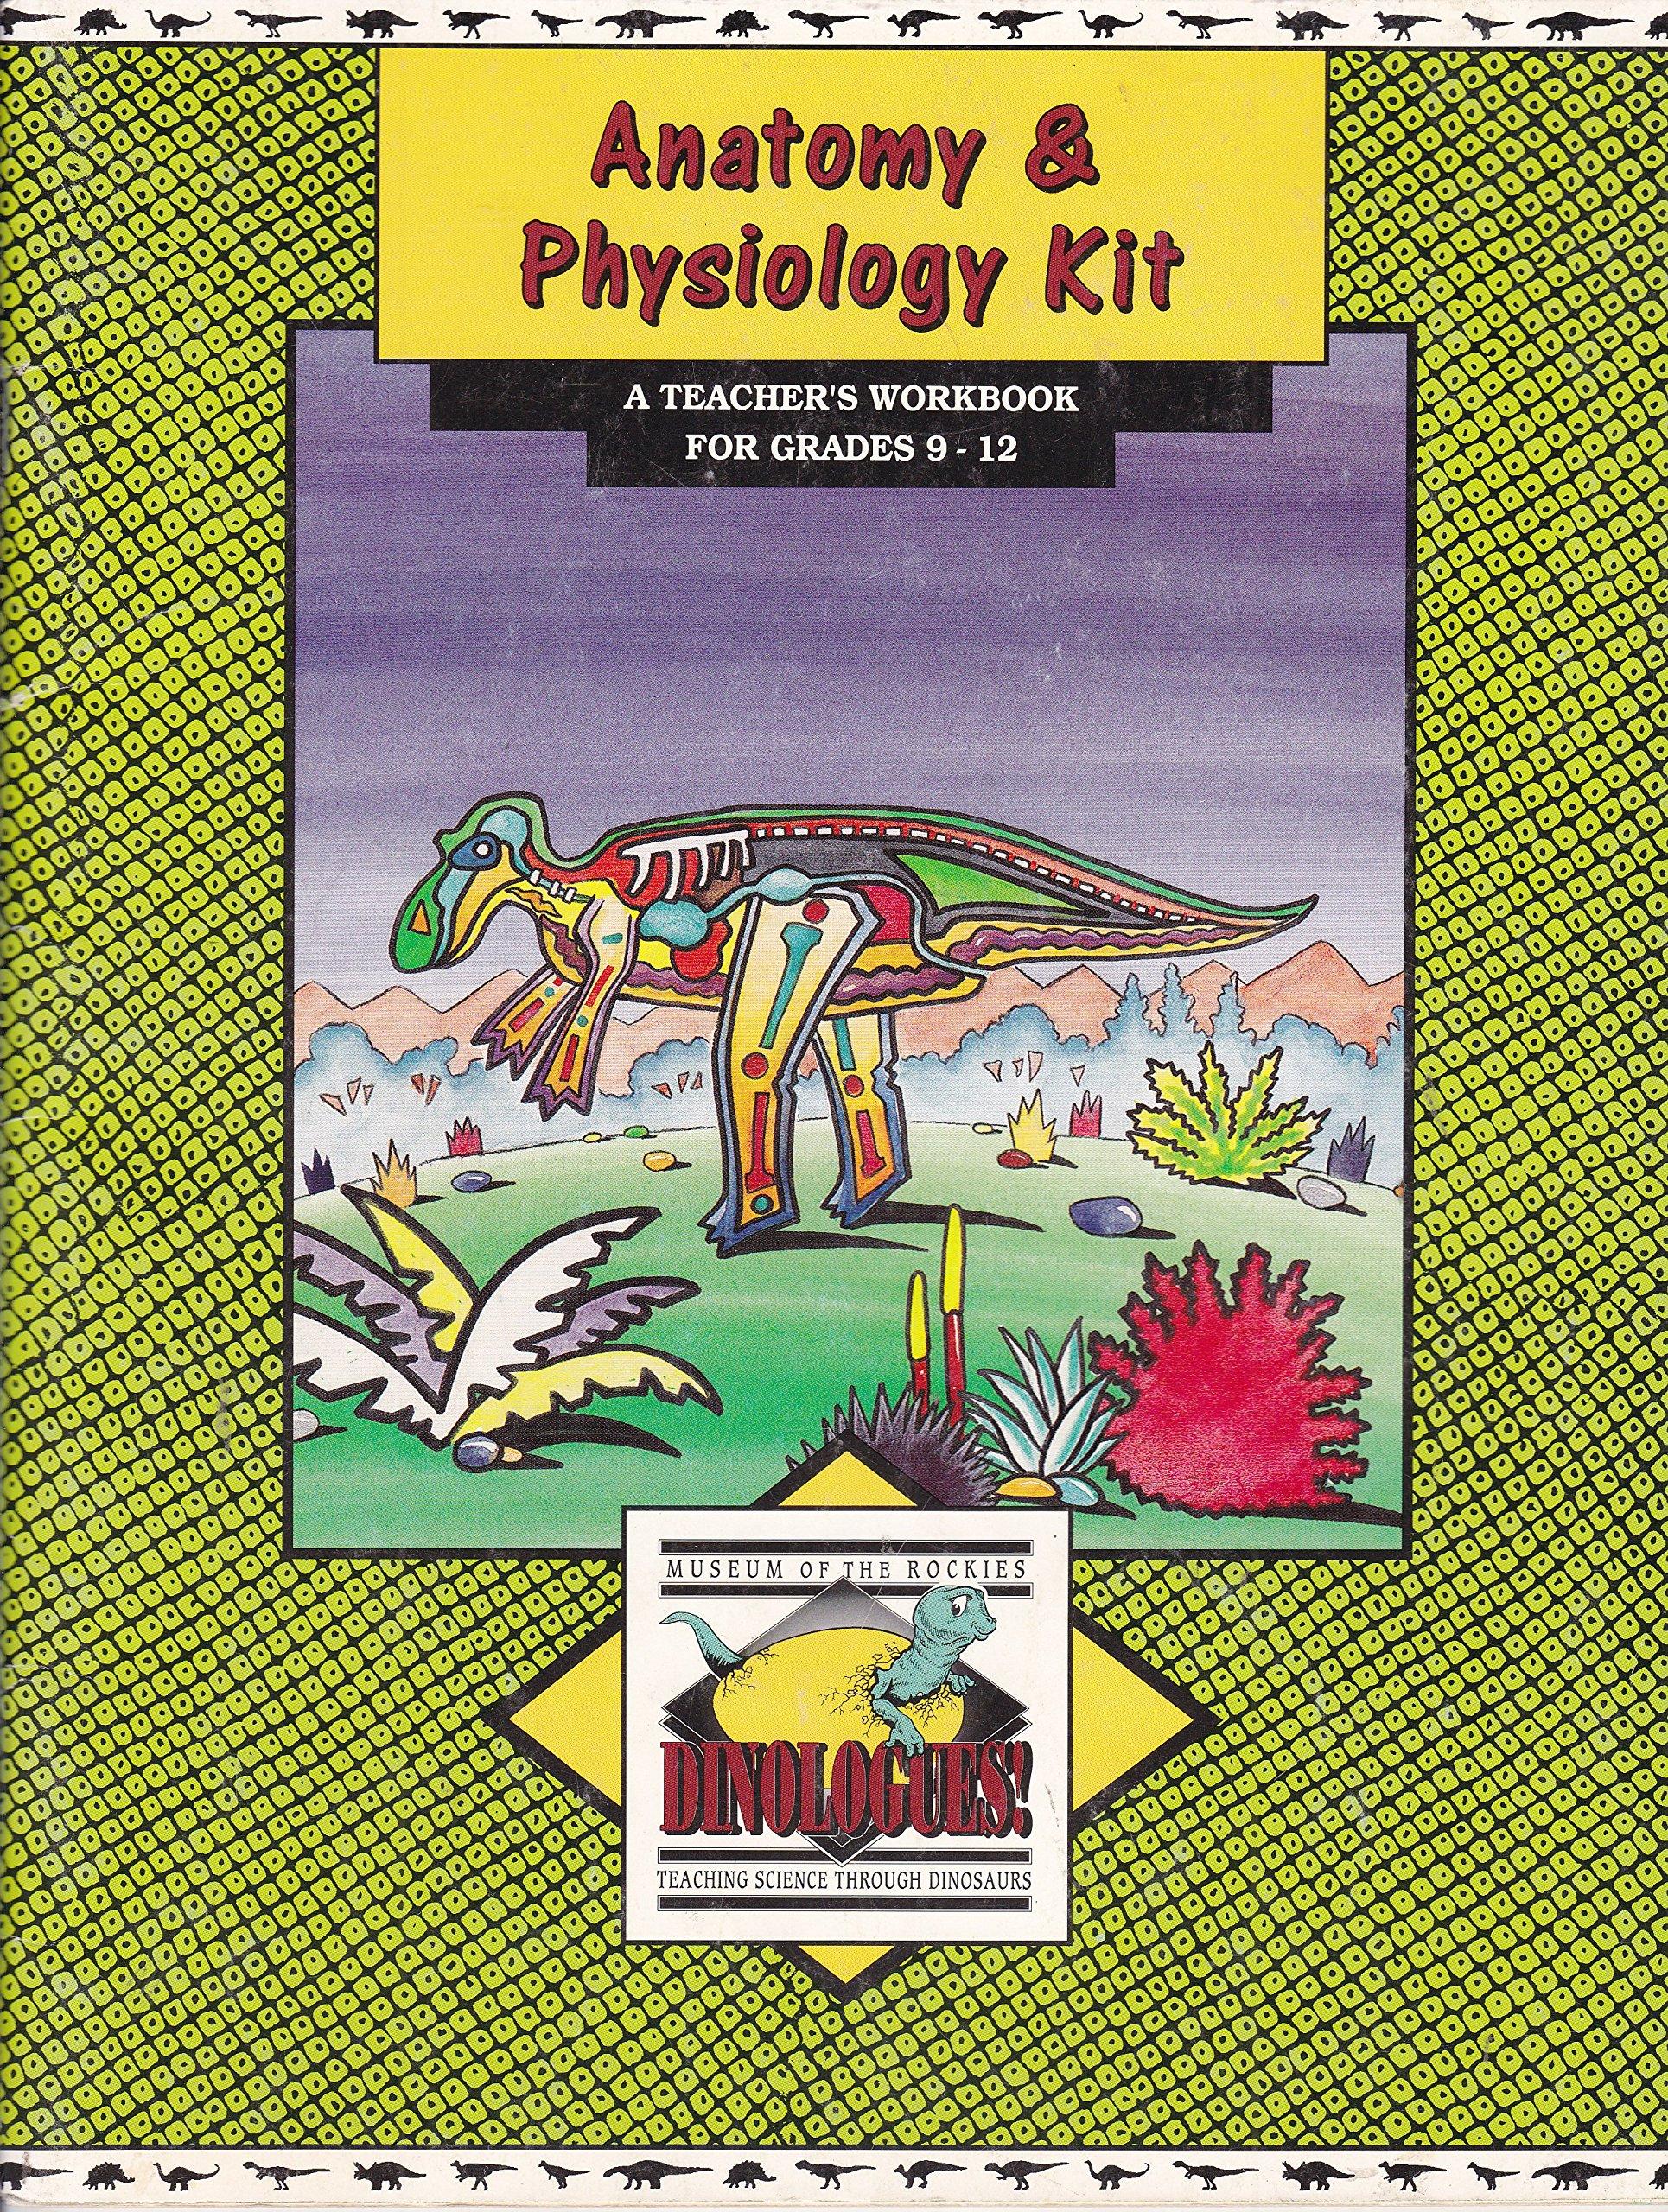 Anatomy & Physiology Kit - a Teacher\'s Workbook for Grades 9-12 ...